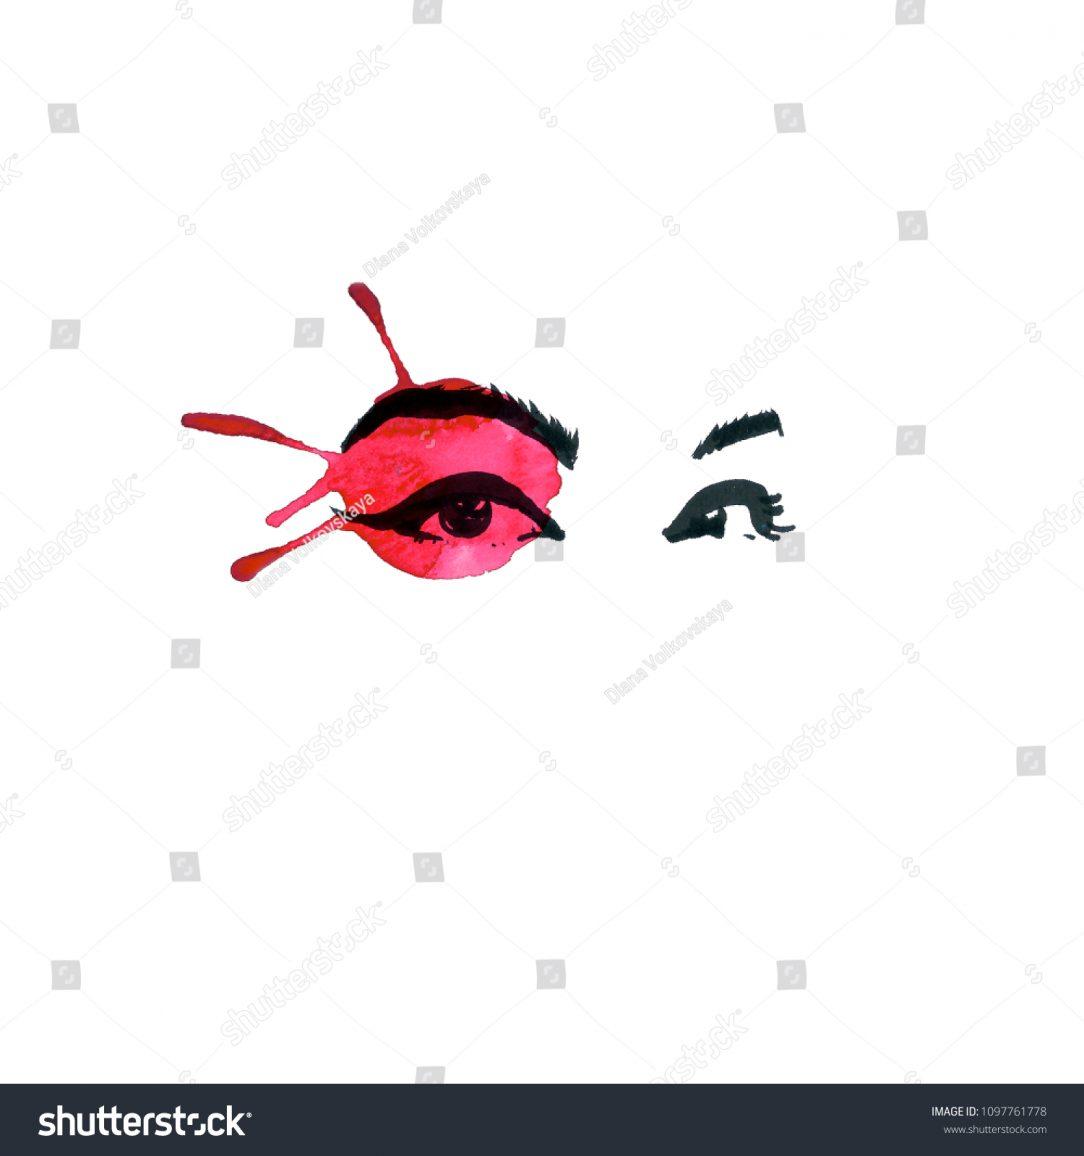 1084x1156 Eyes Drawing Crying Basic Asian Boy Anime Cartoon